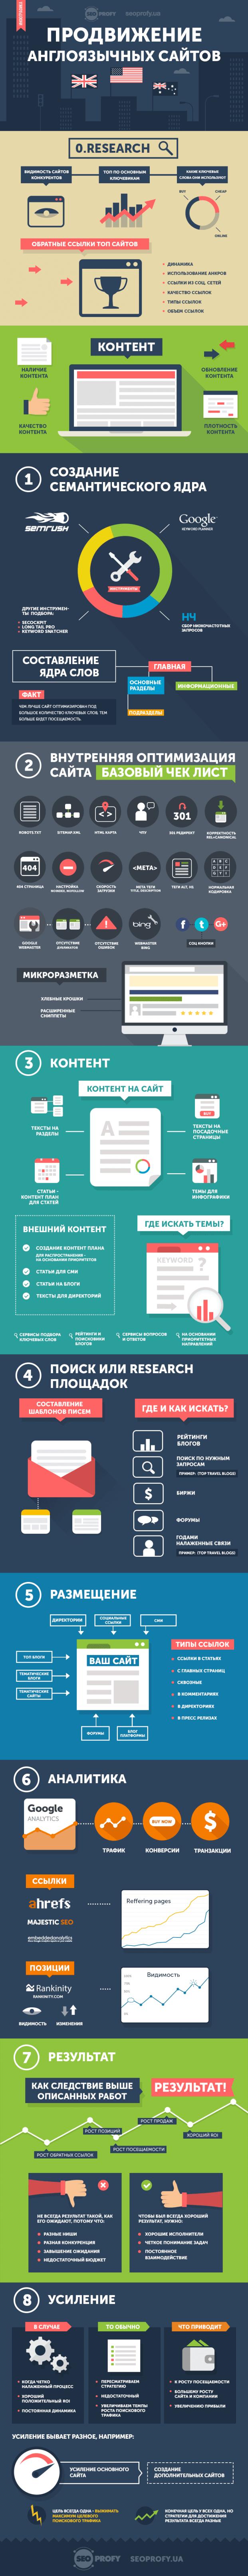 english-seo-seoprofy-infographic-621x645